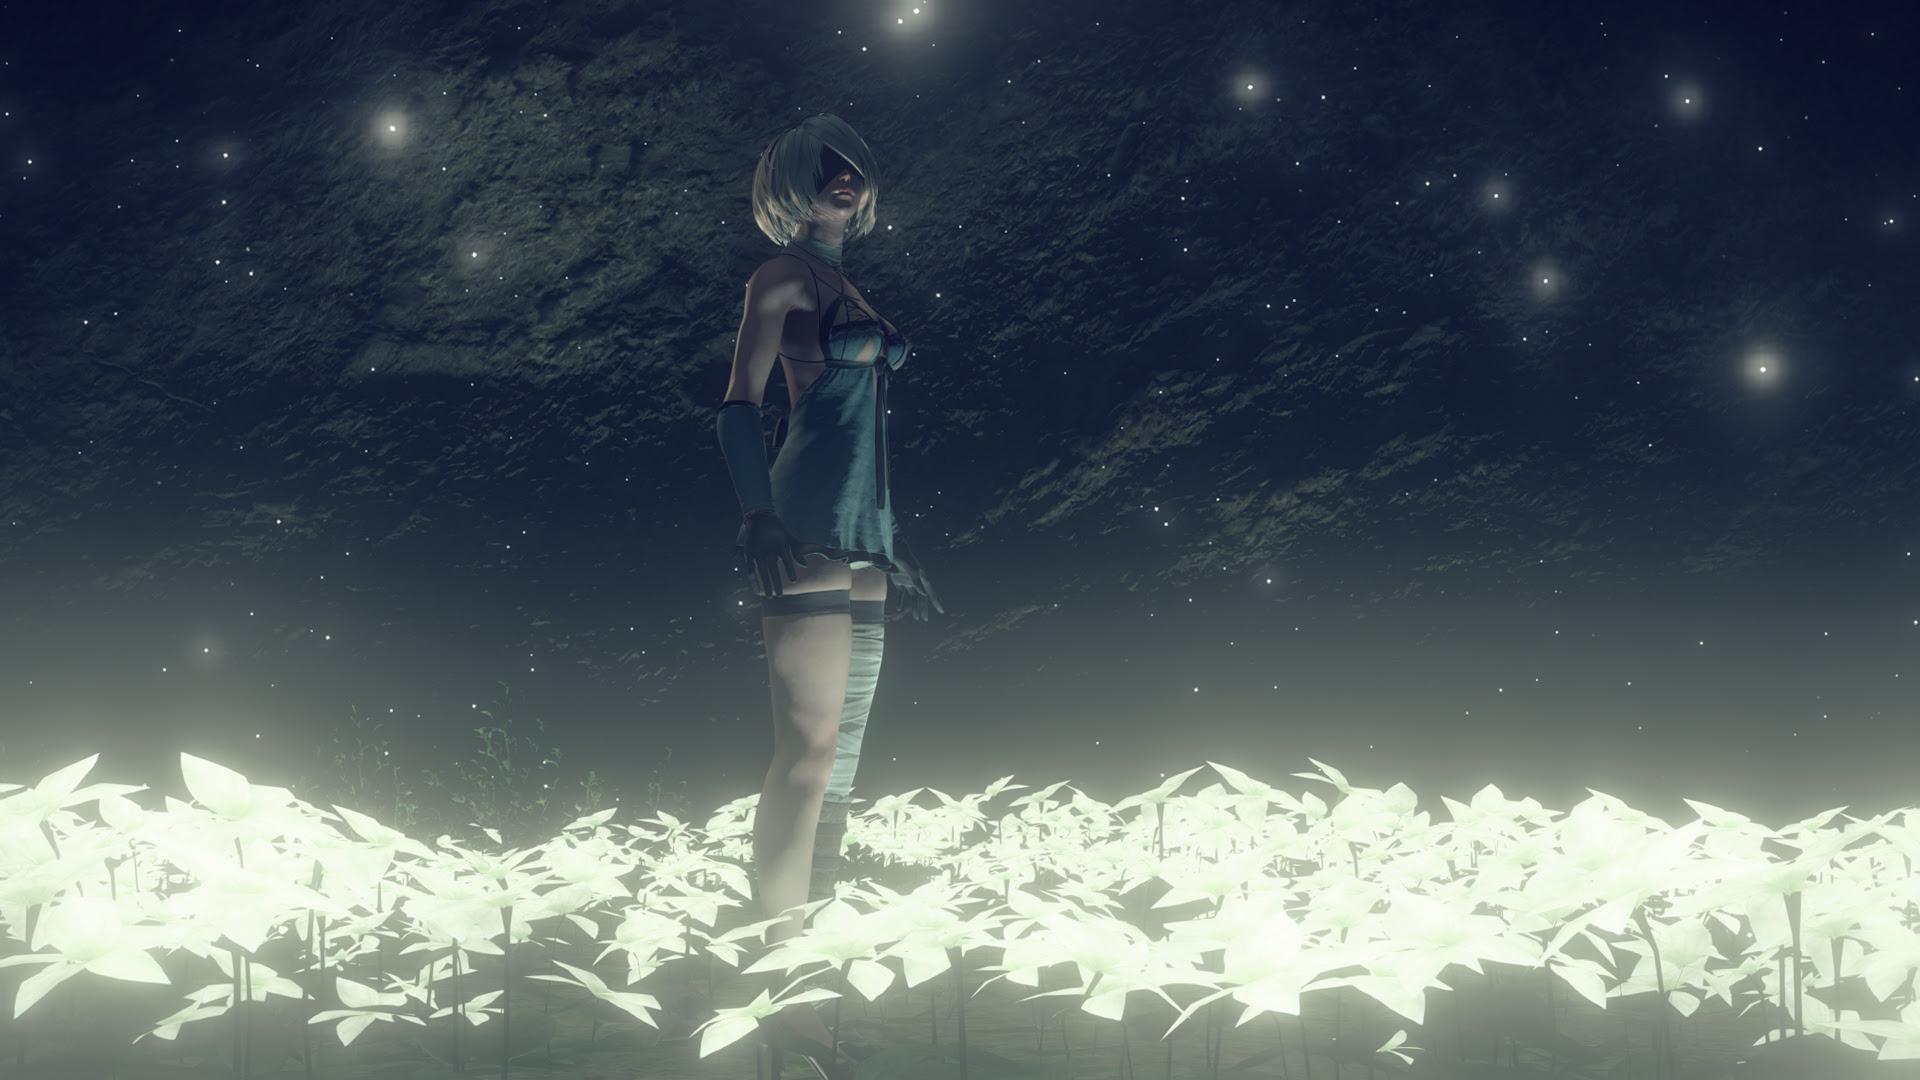 Final Fantasy Brave Exvius just got a whole lotta NieR screenshot